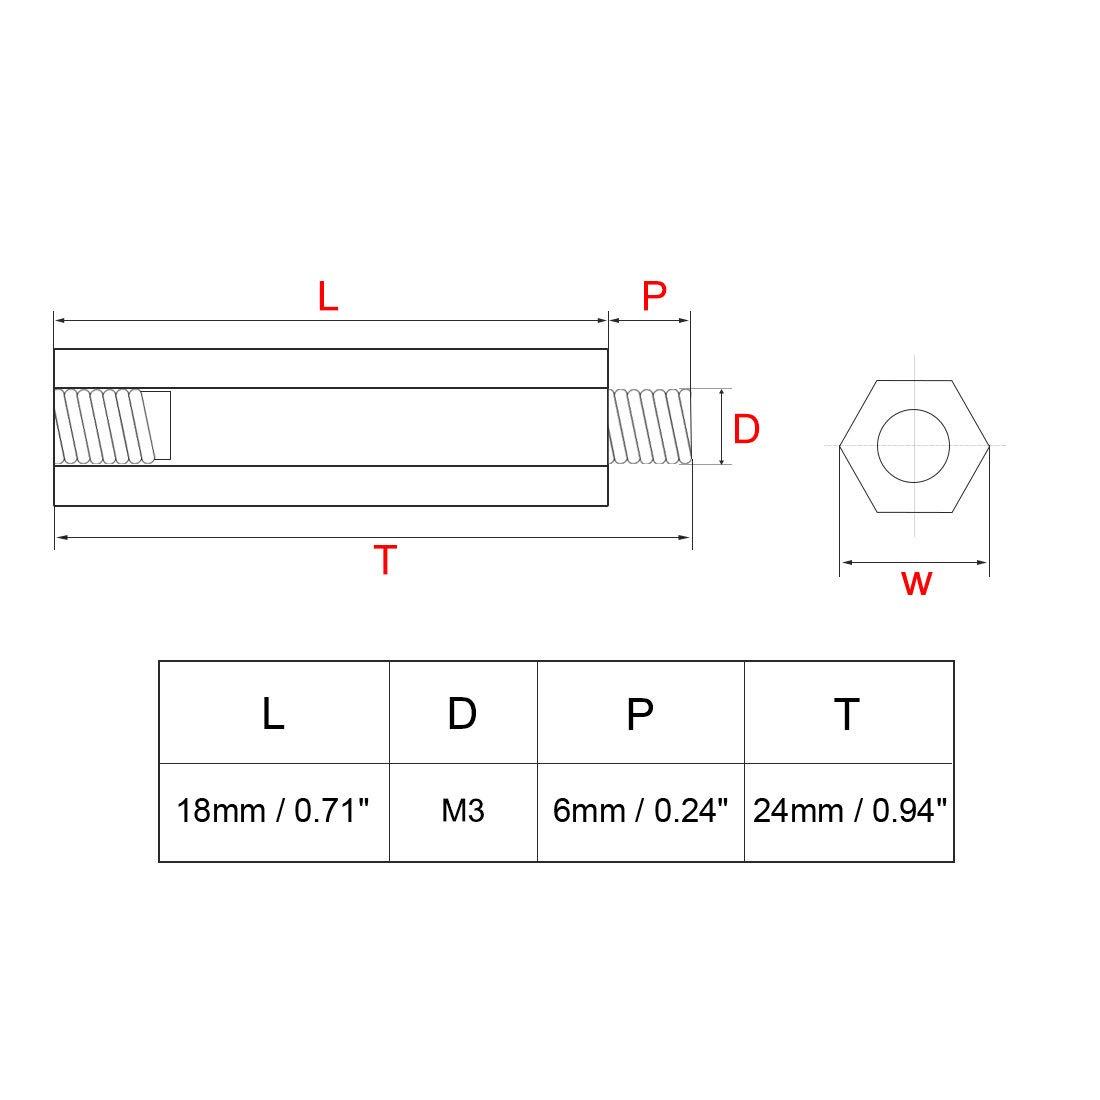 uxcell 100pcs M2 23+4mm Female Male Thread Brass Standoff Spacer Screws PCB Pillar